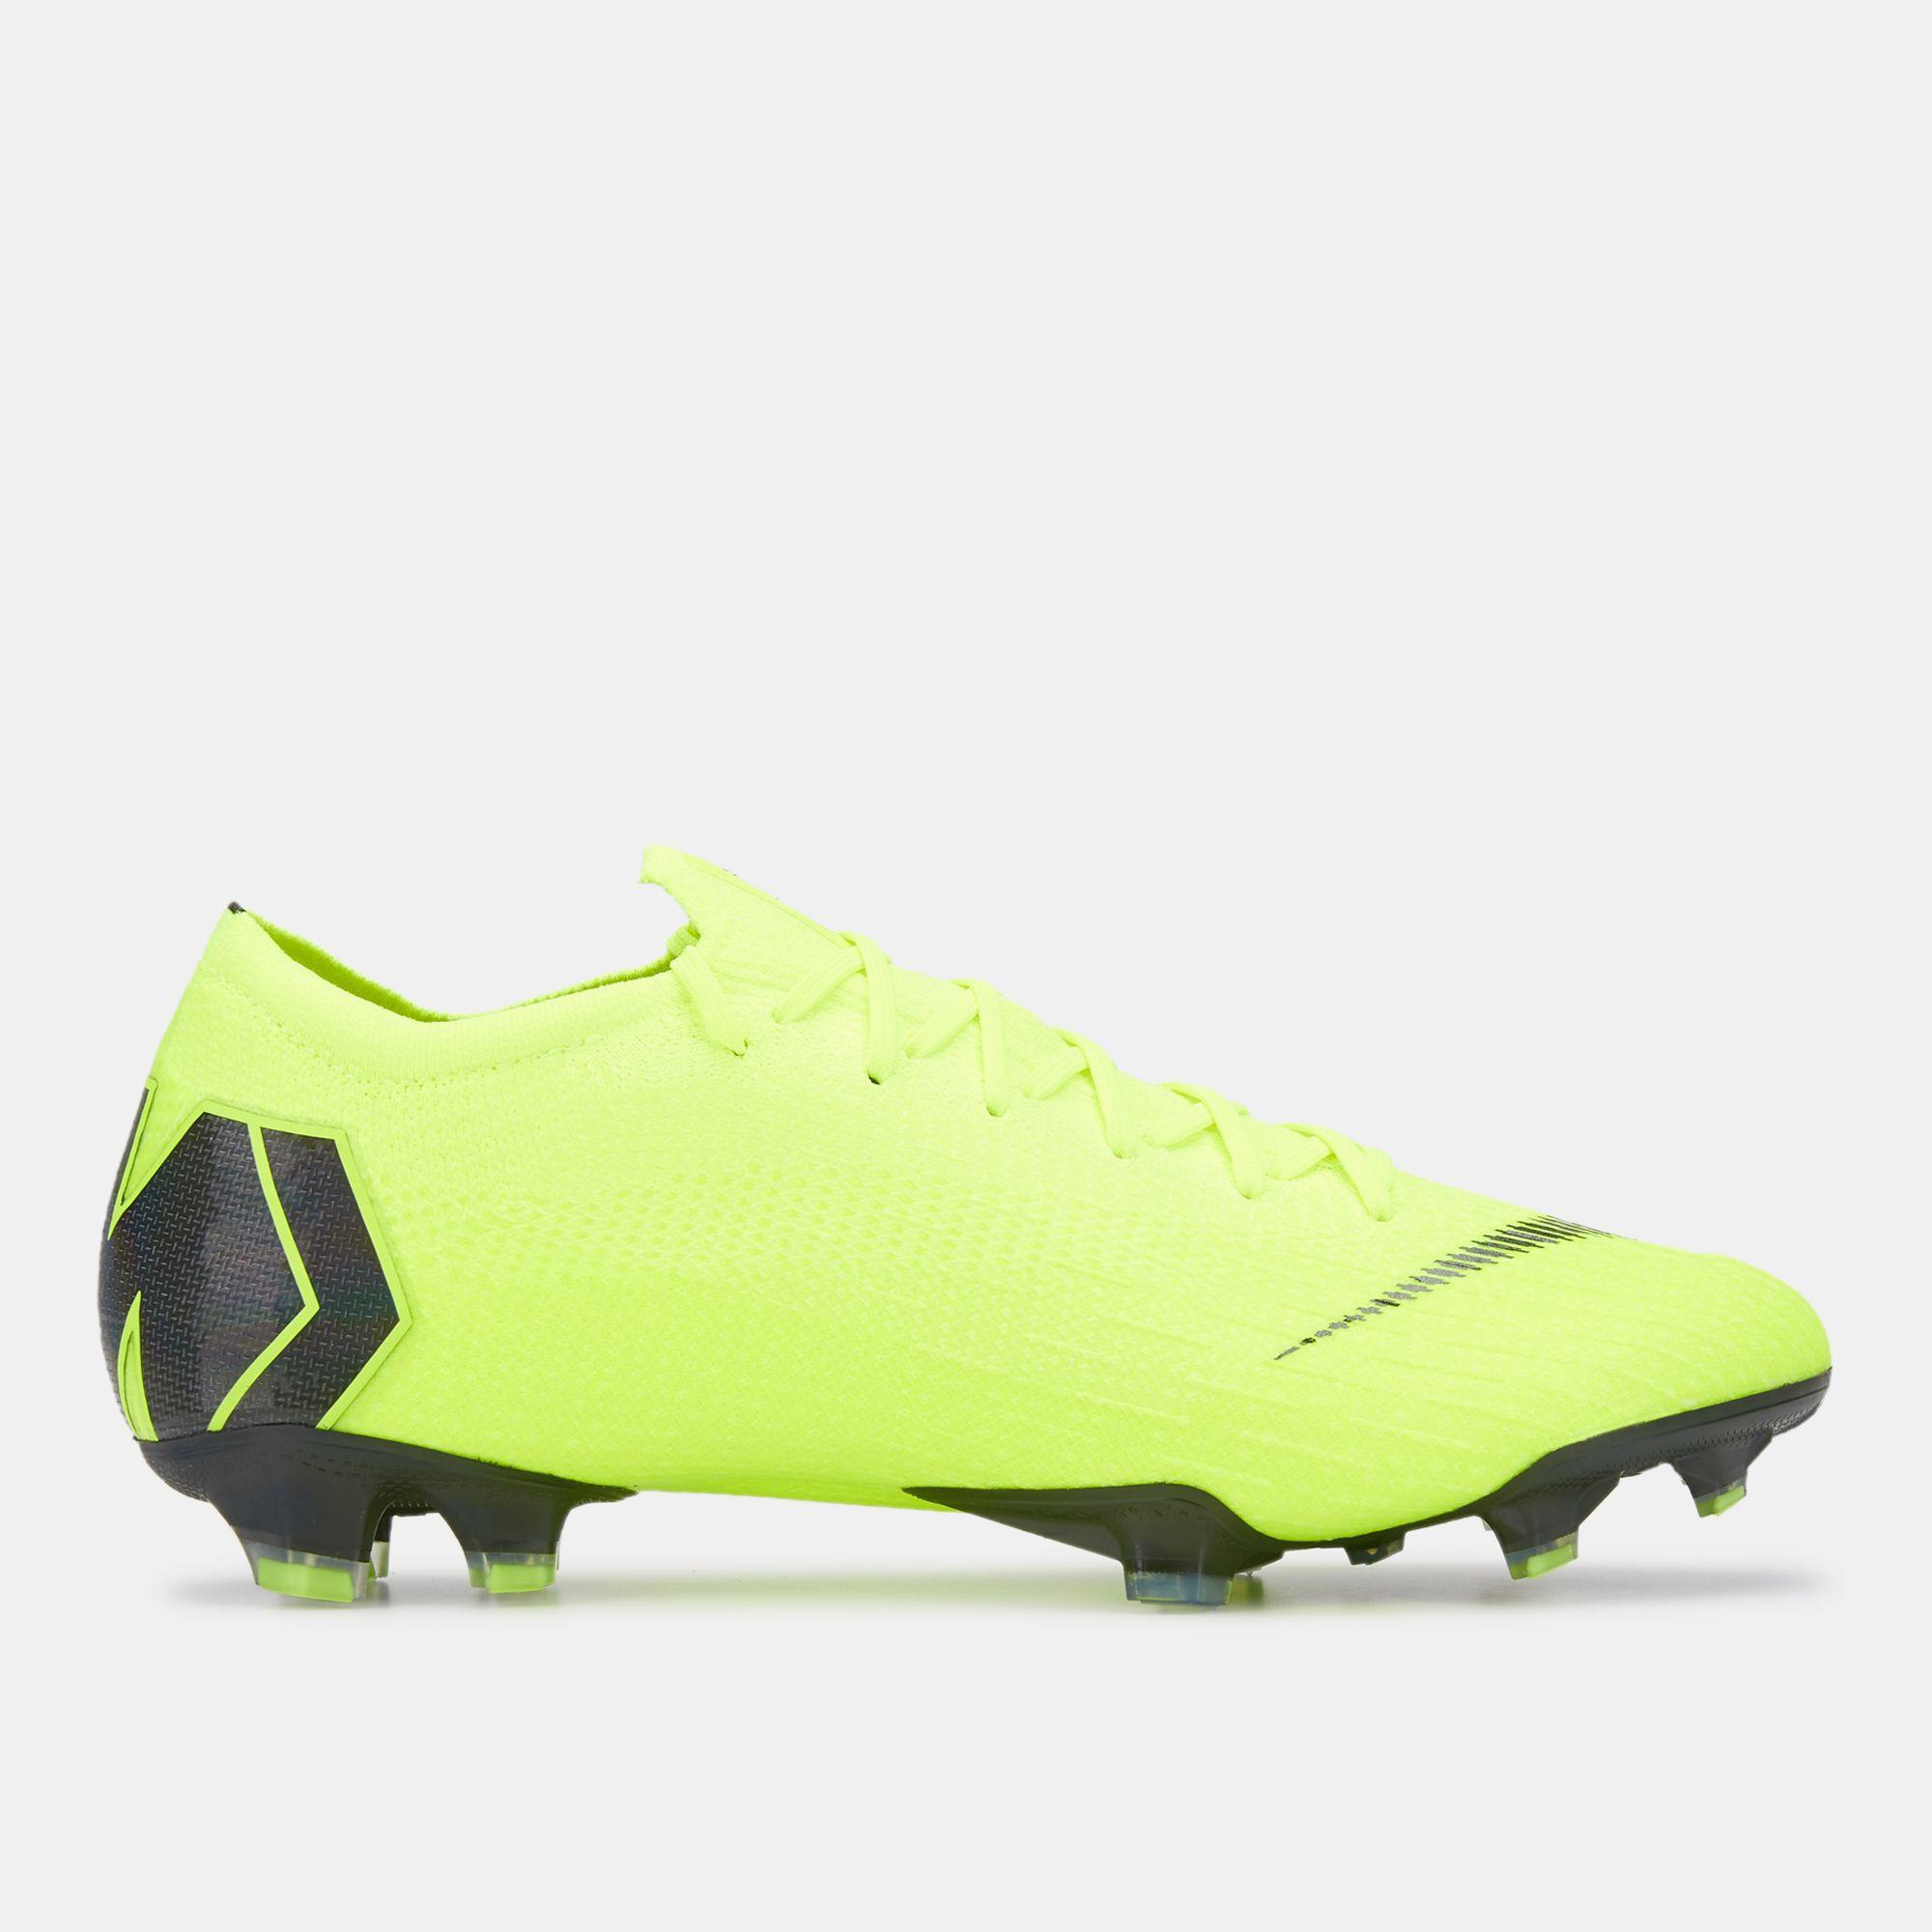 fef4b4358 ... official nike mercurial vapor 360 elite firm ground football shoe 19ab0  621eb